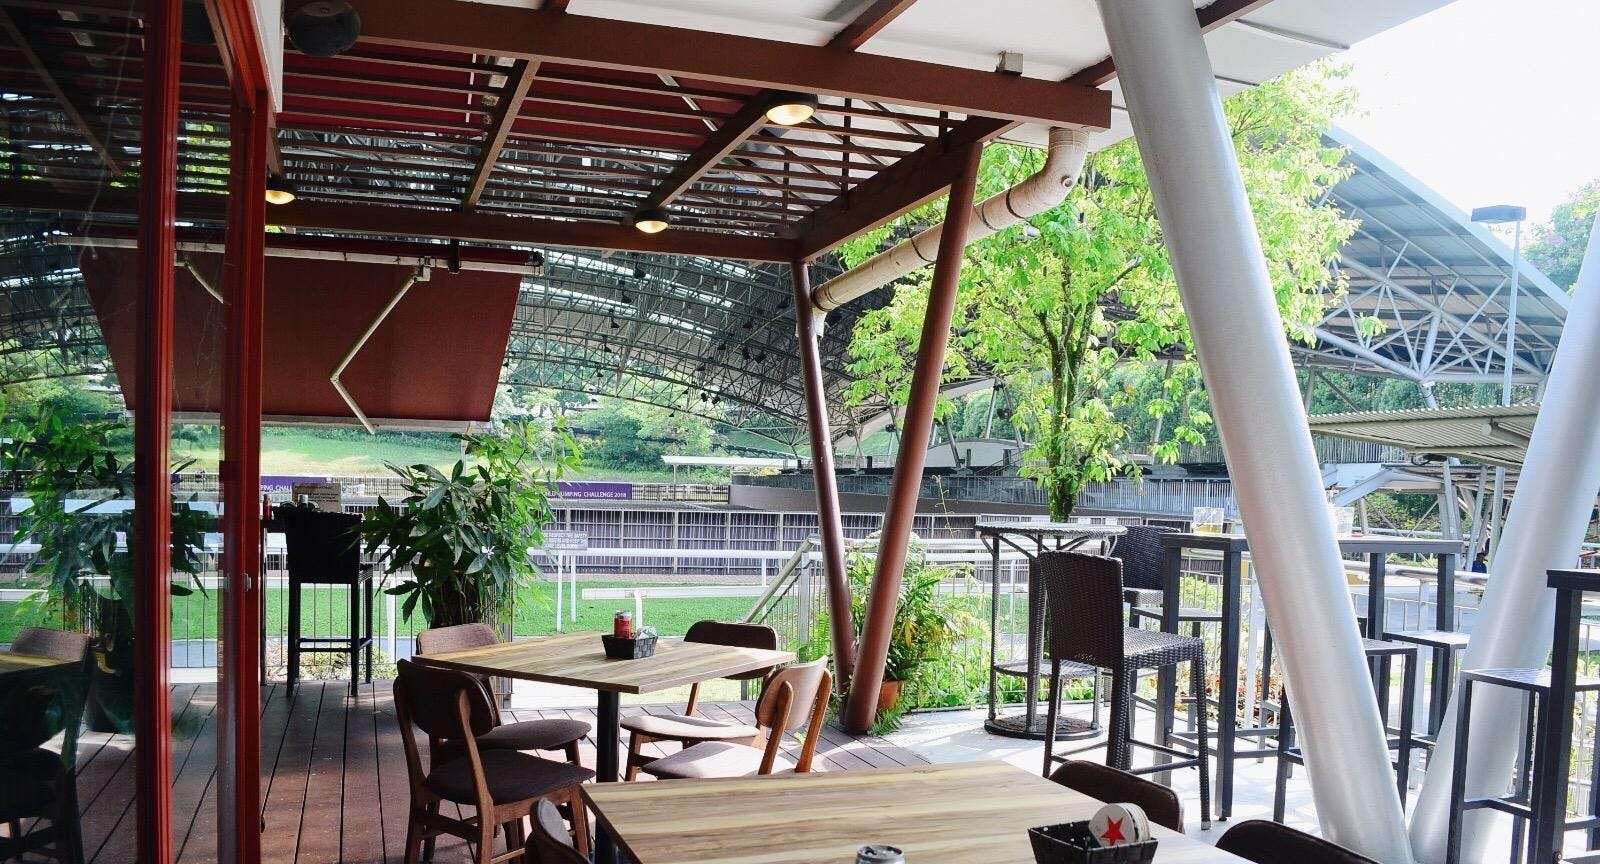 Cheval Cafe Bar Bistro Singapore image 1